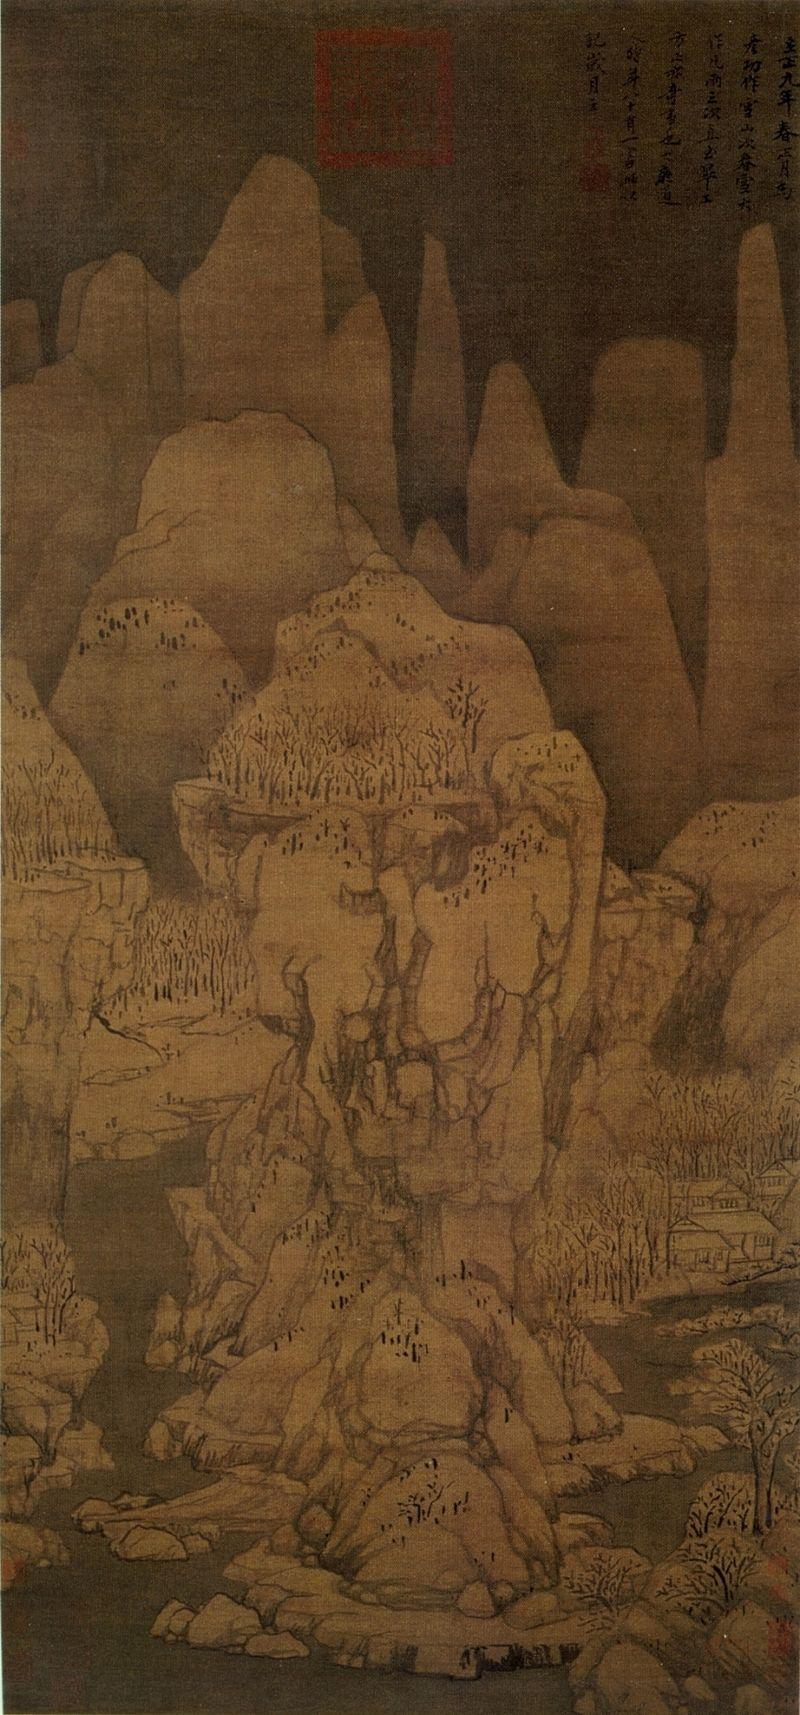 Huang_Gongwang._Nine_Picks_After_Snow._116,4_x54,8_cm._Palace_Museum,_BeijingХуан Гунван. Девять вершин после снегопада.